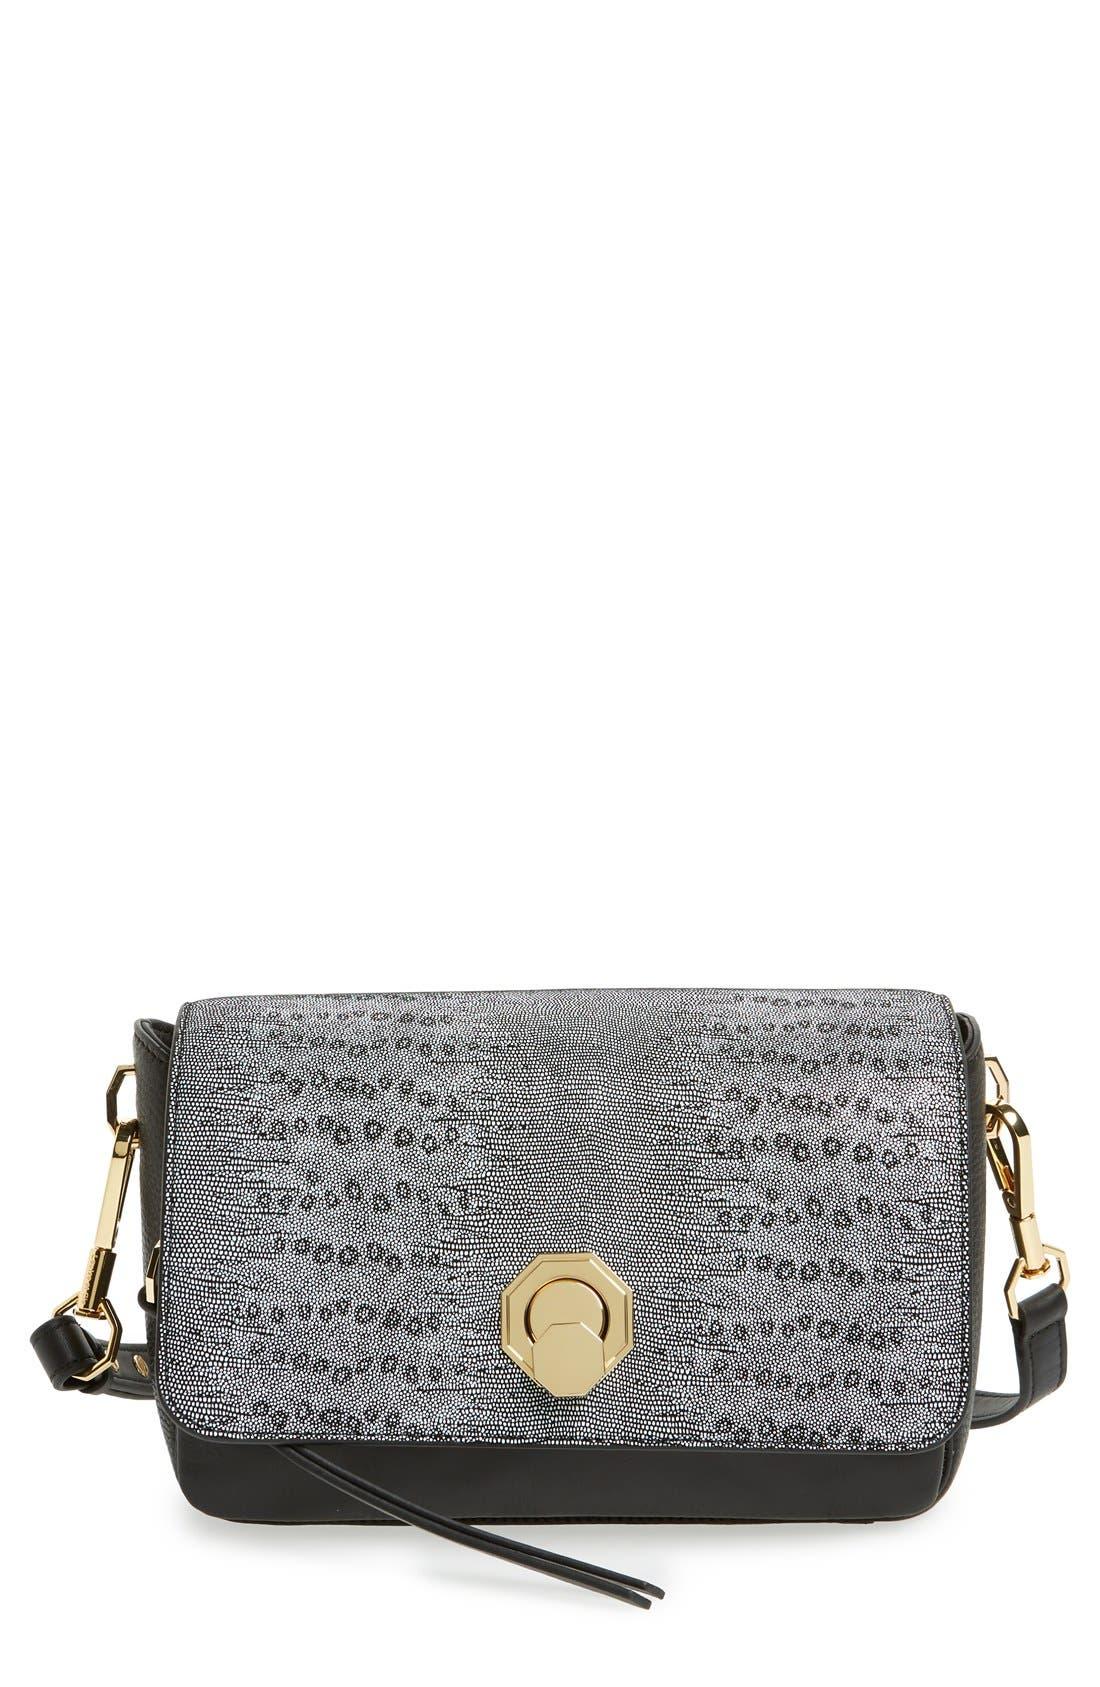 'Small Alis' Leather Crossbody Bag,                             Main thumbnail 1, color,                             001